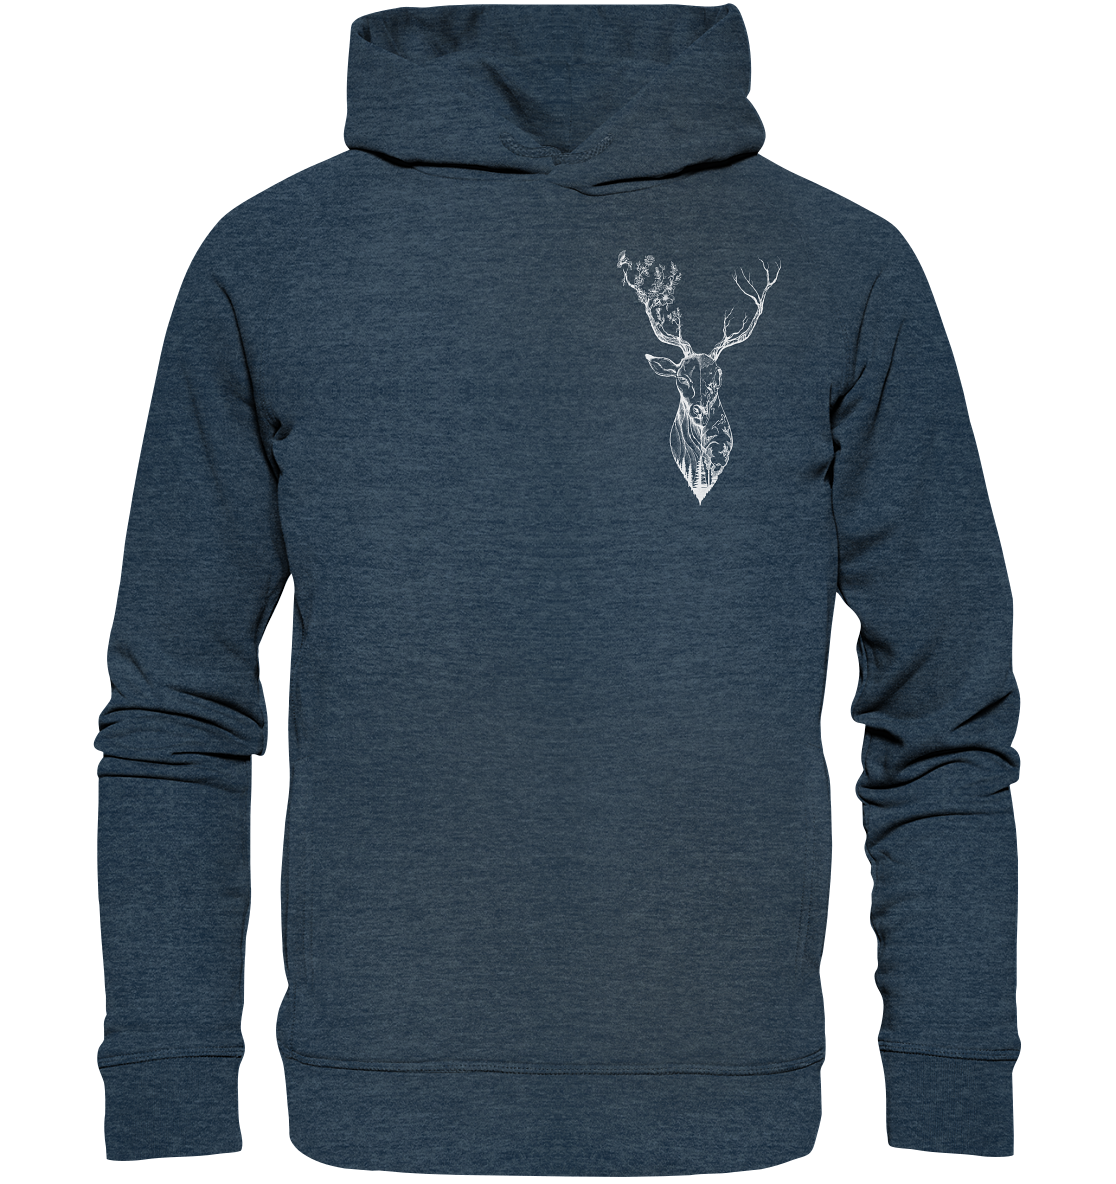 front-organic-fashion-hoodie-102940-1116x-6.png